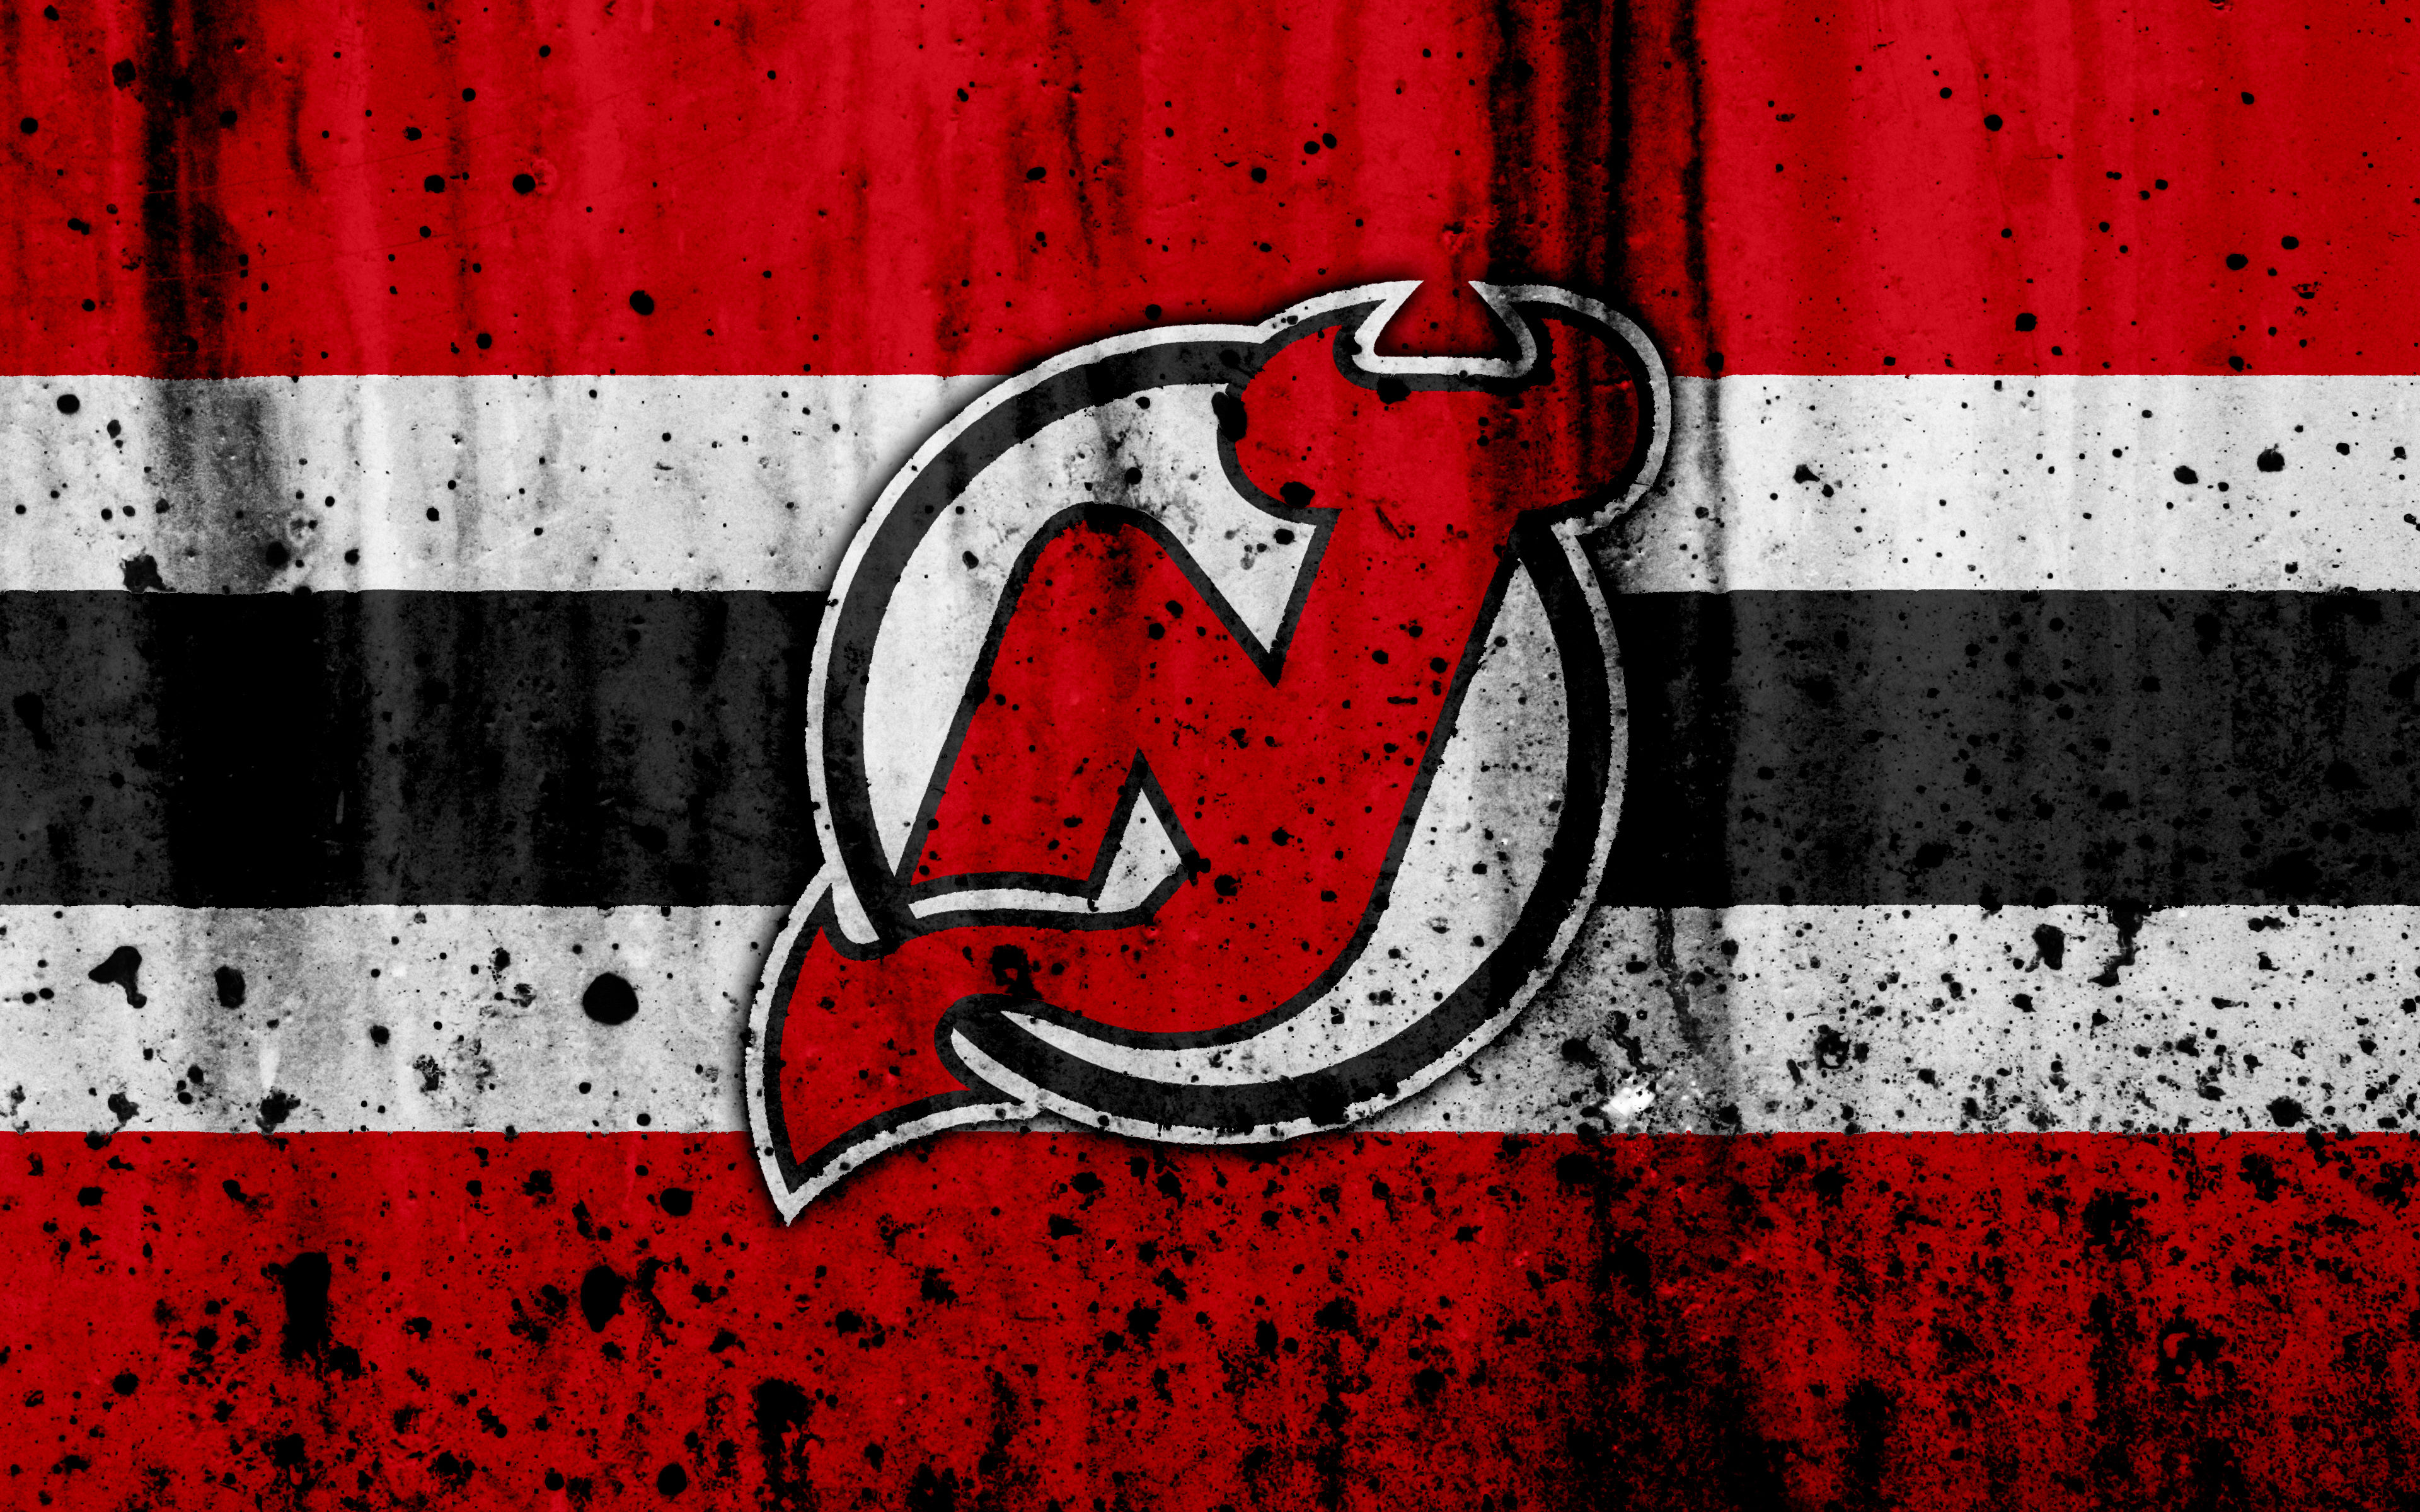 New Jersey Devils 4k Ultra Hd Wallpaper Background Image